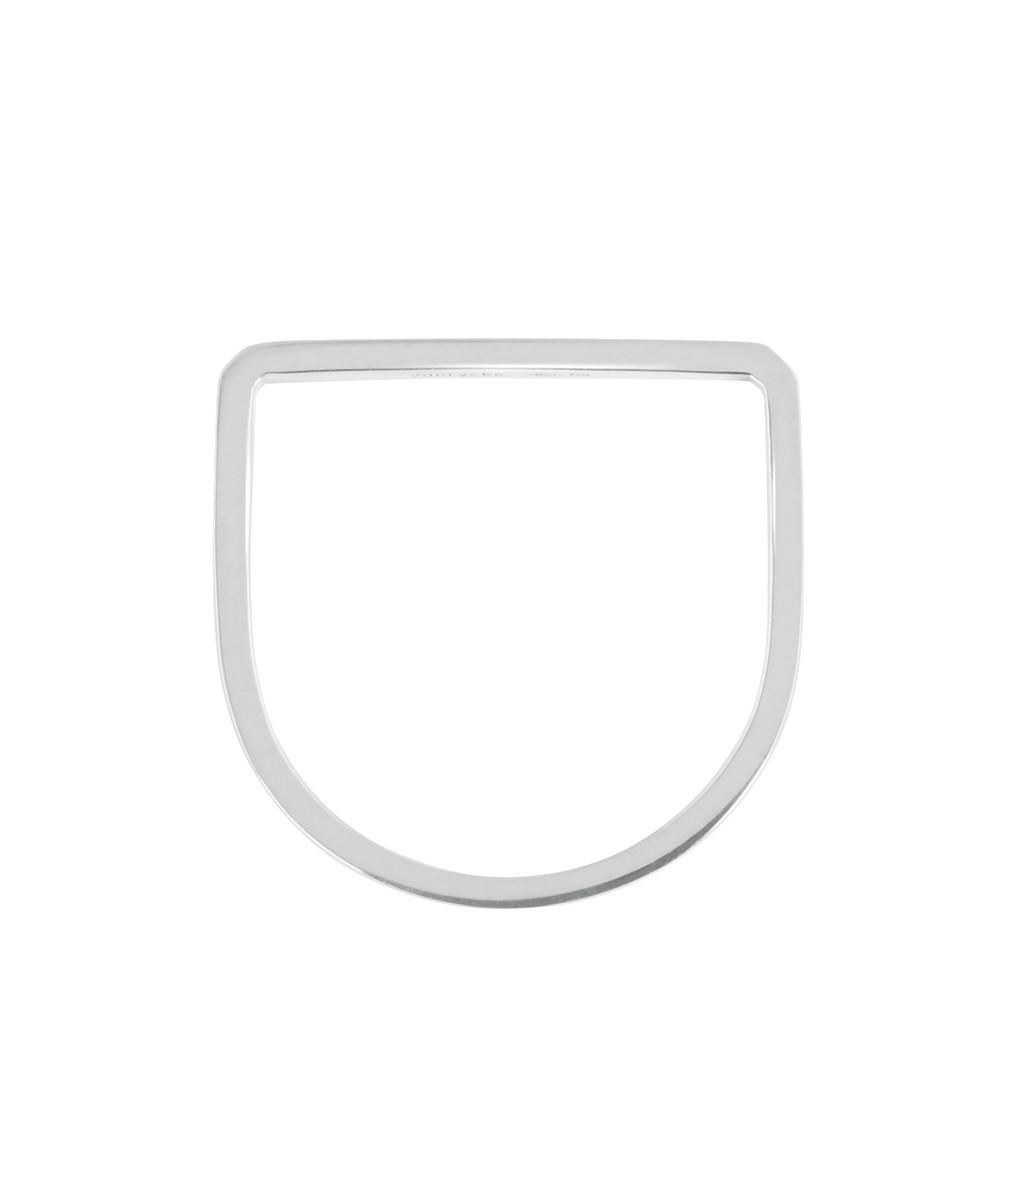 VANRYCKE - Bague Medellin Carré Or Blanc Diamants